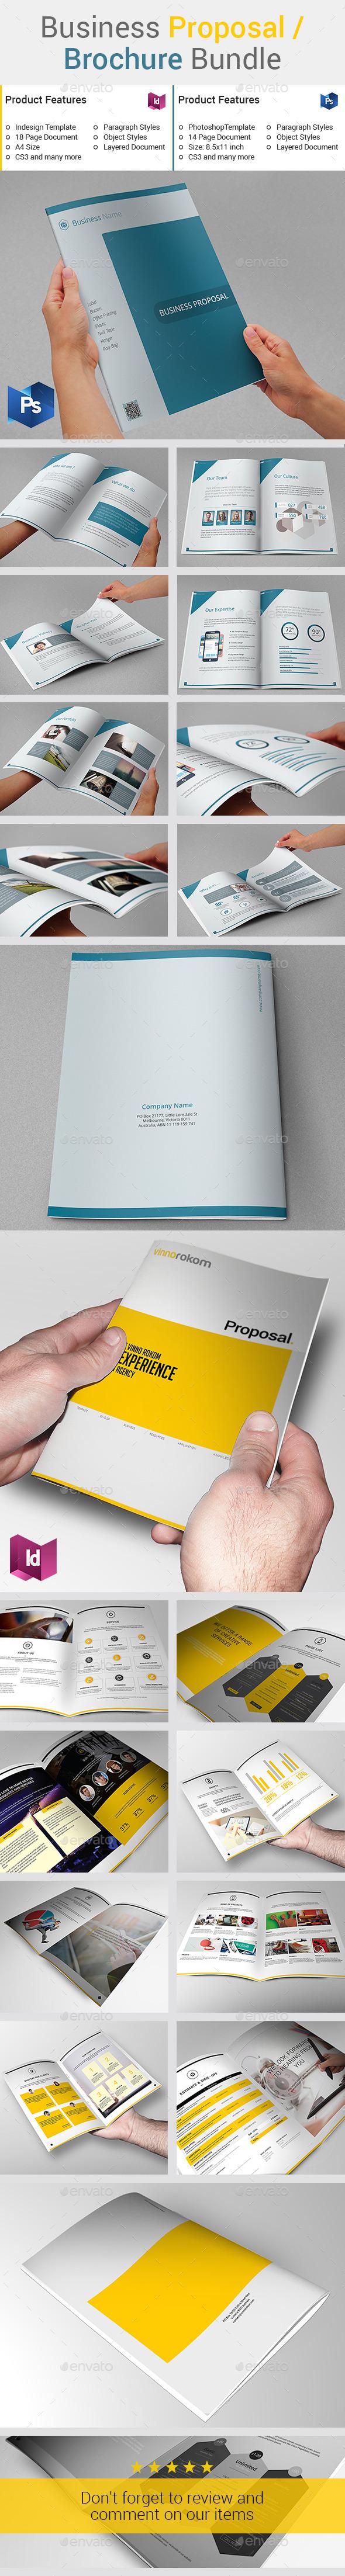 Business Proposal / Brochure Bundle - Informational Brochures